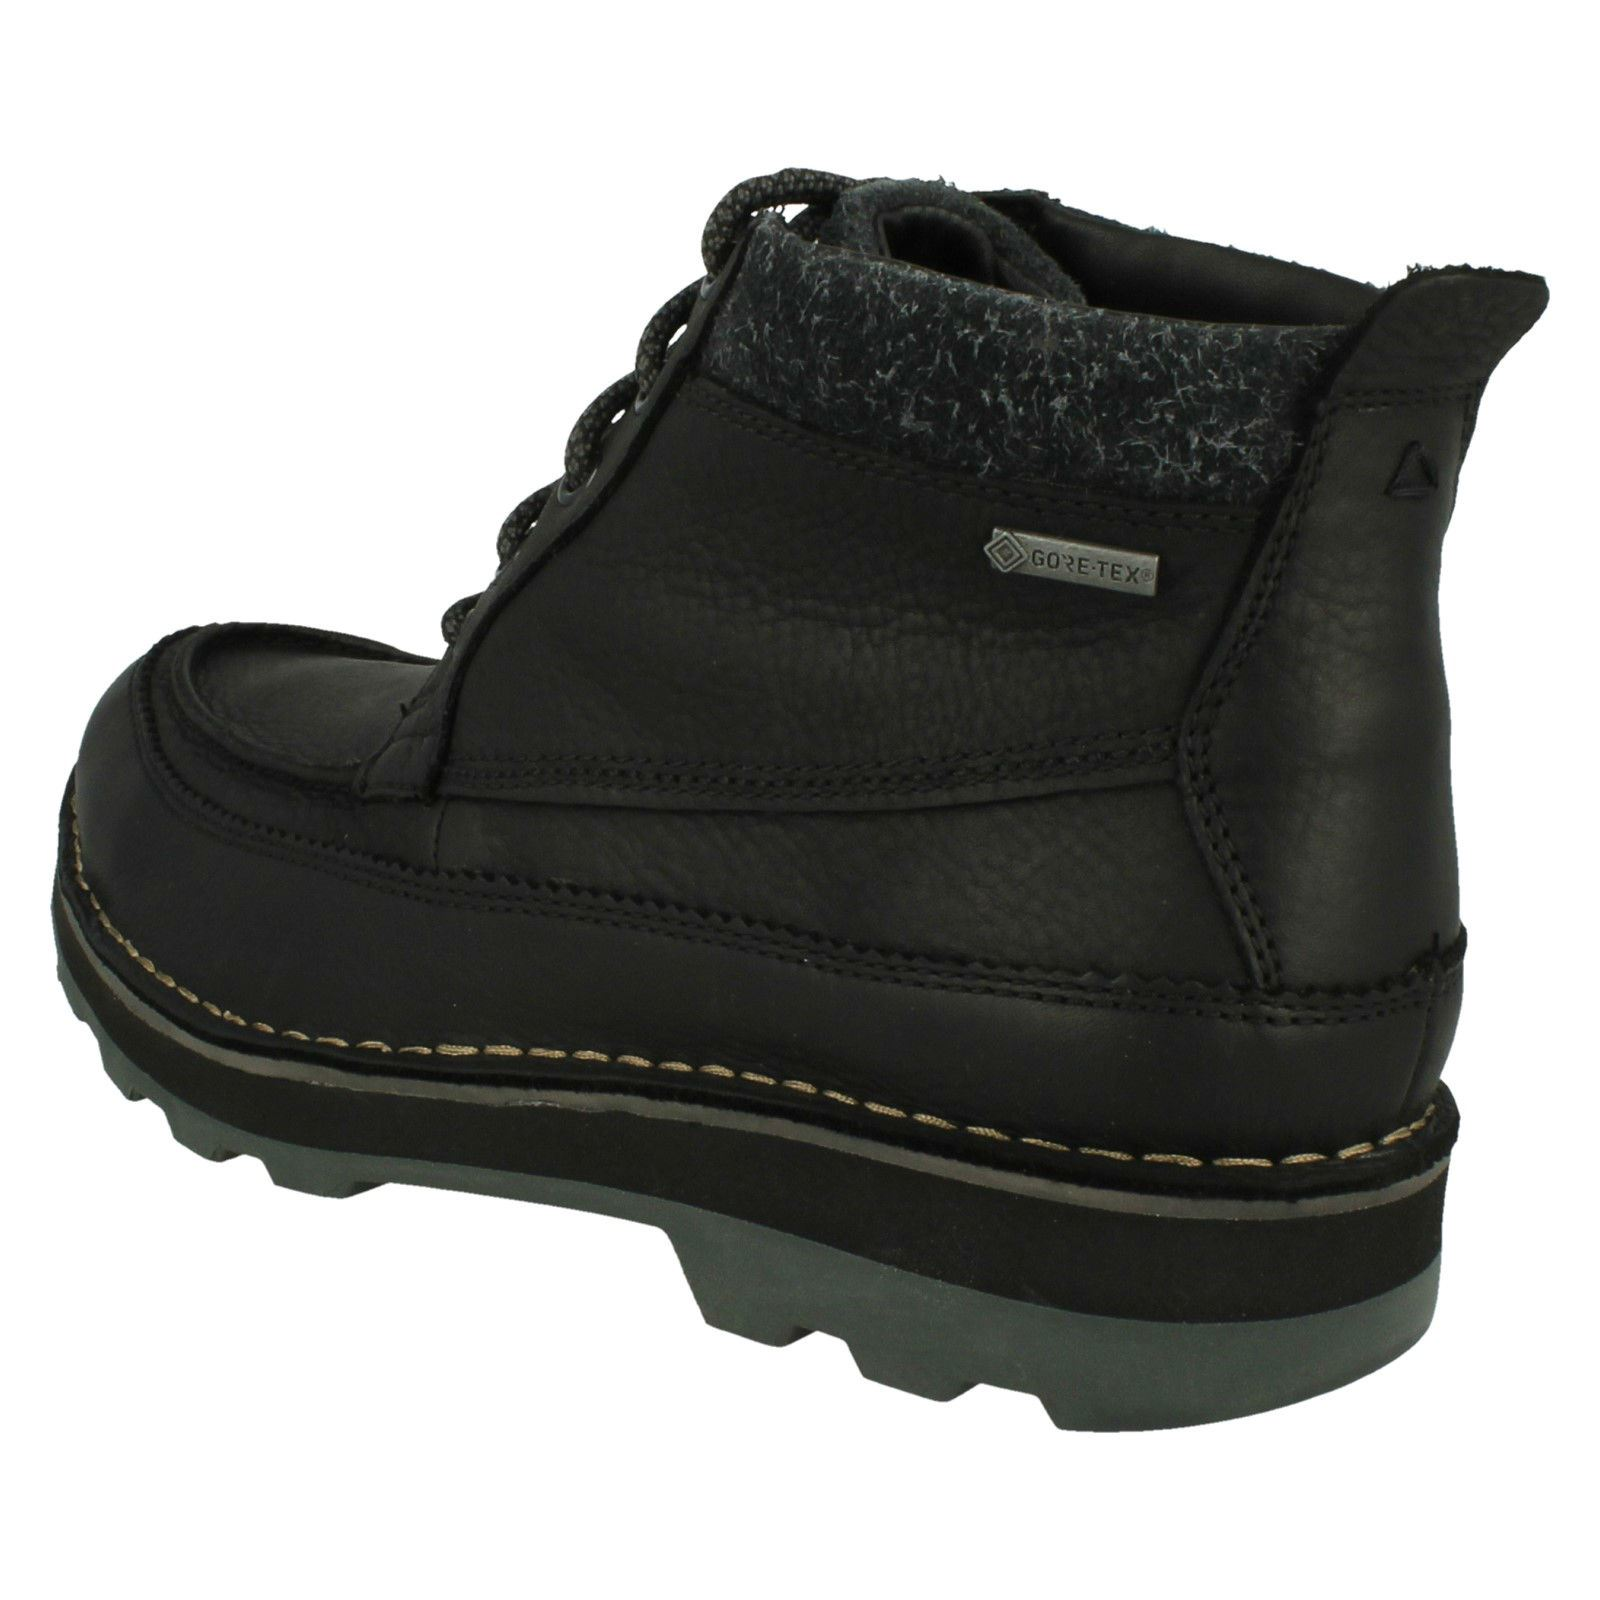 Mens Clarks Casual Gore-Tex Boots